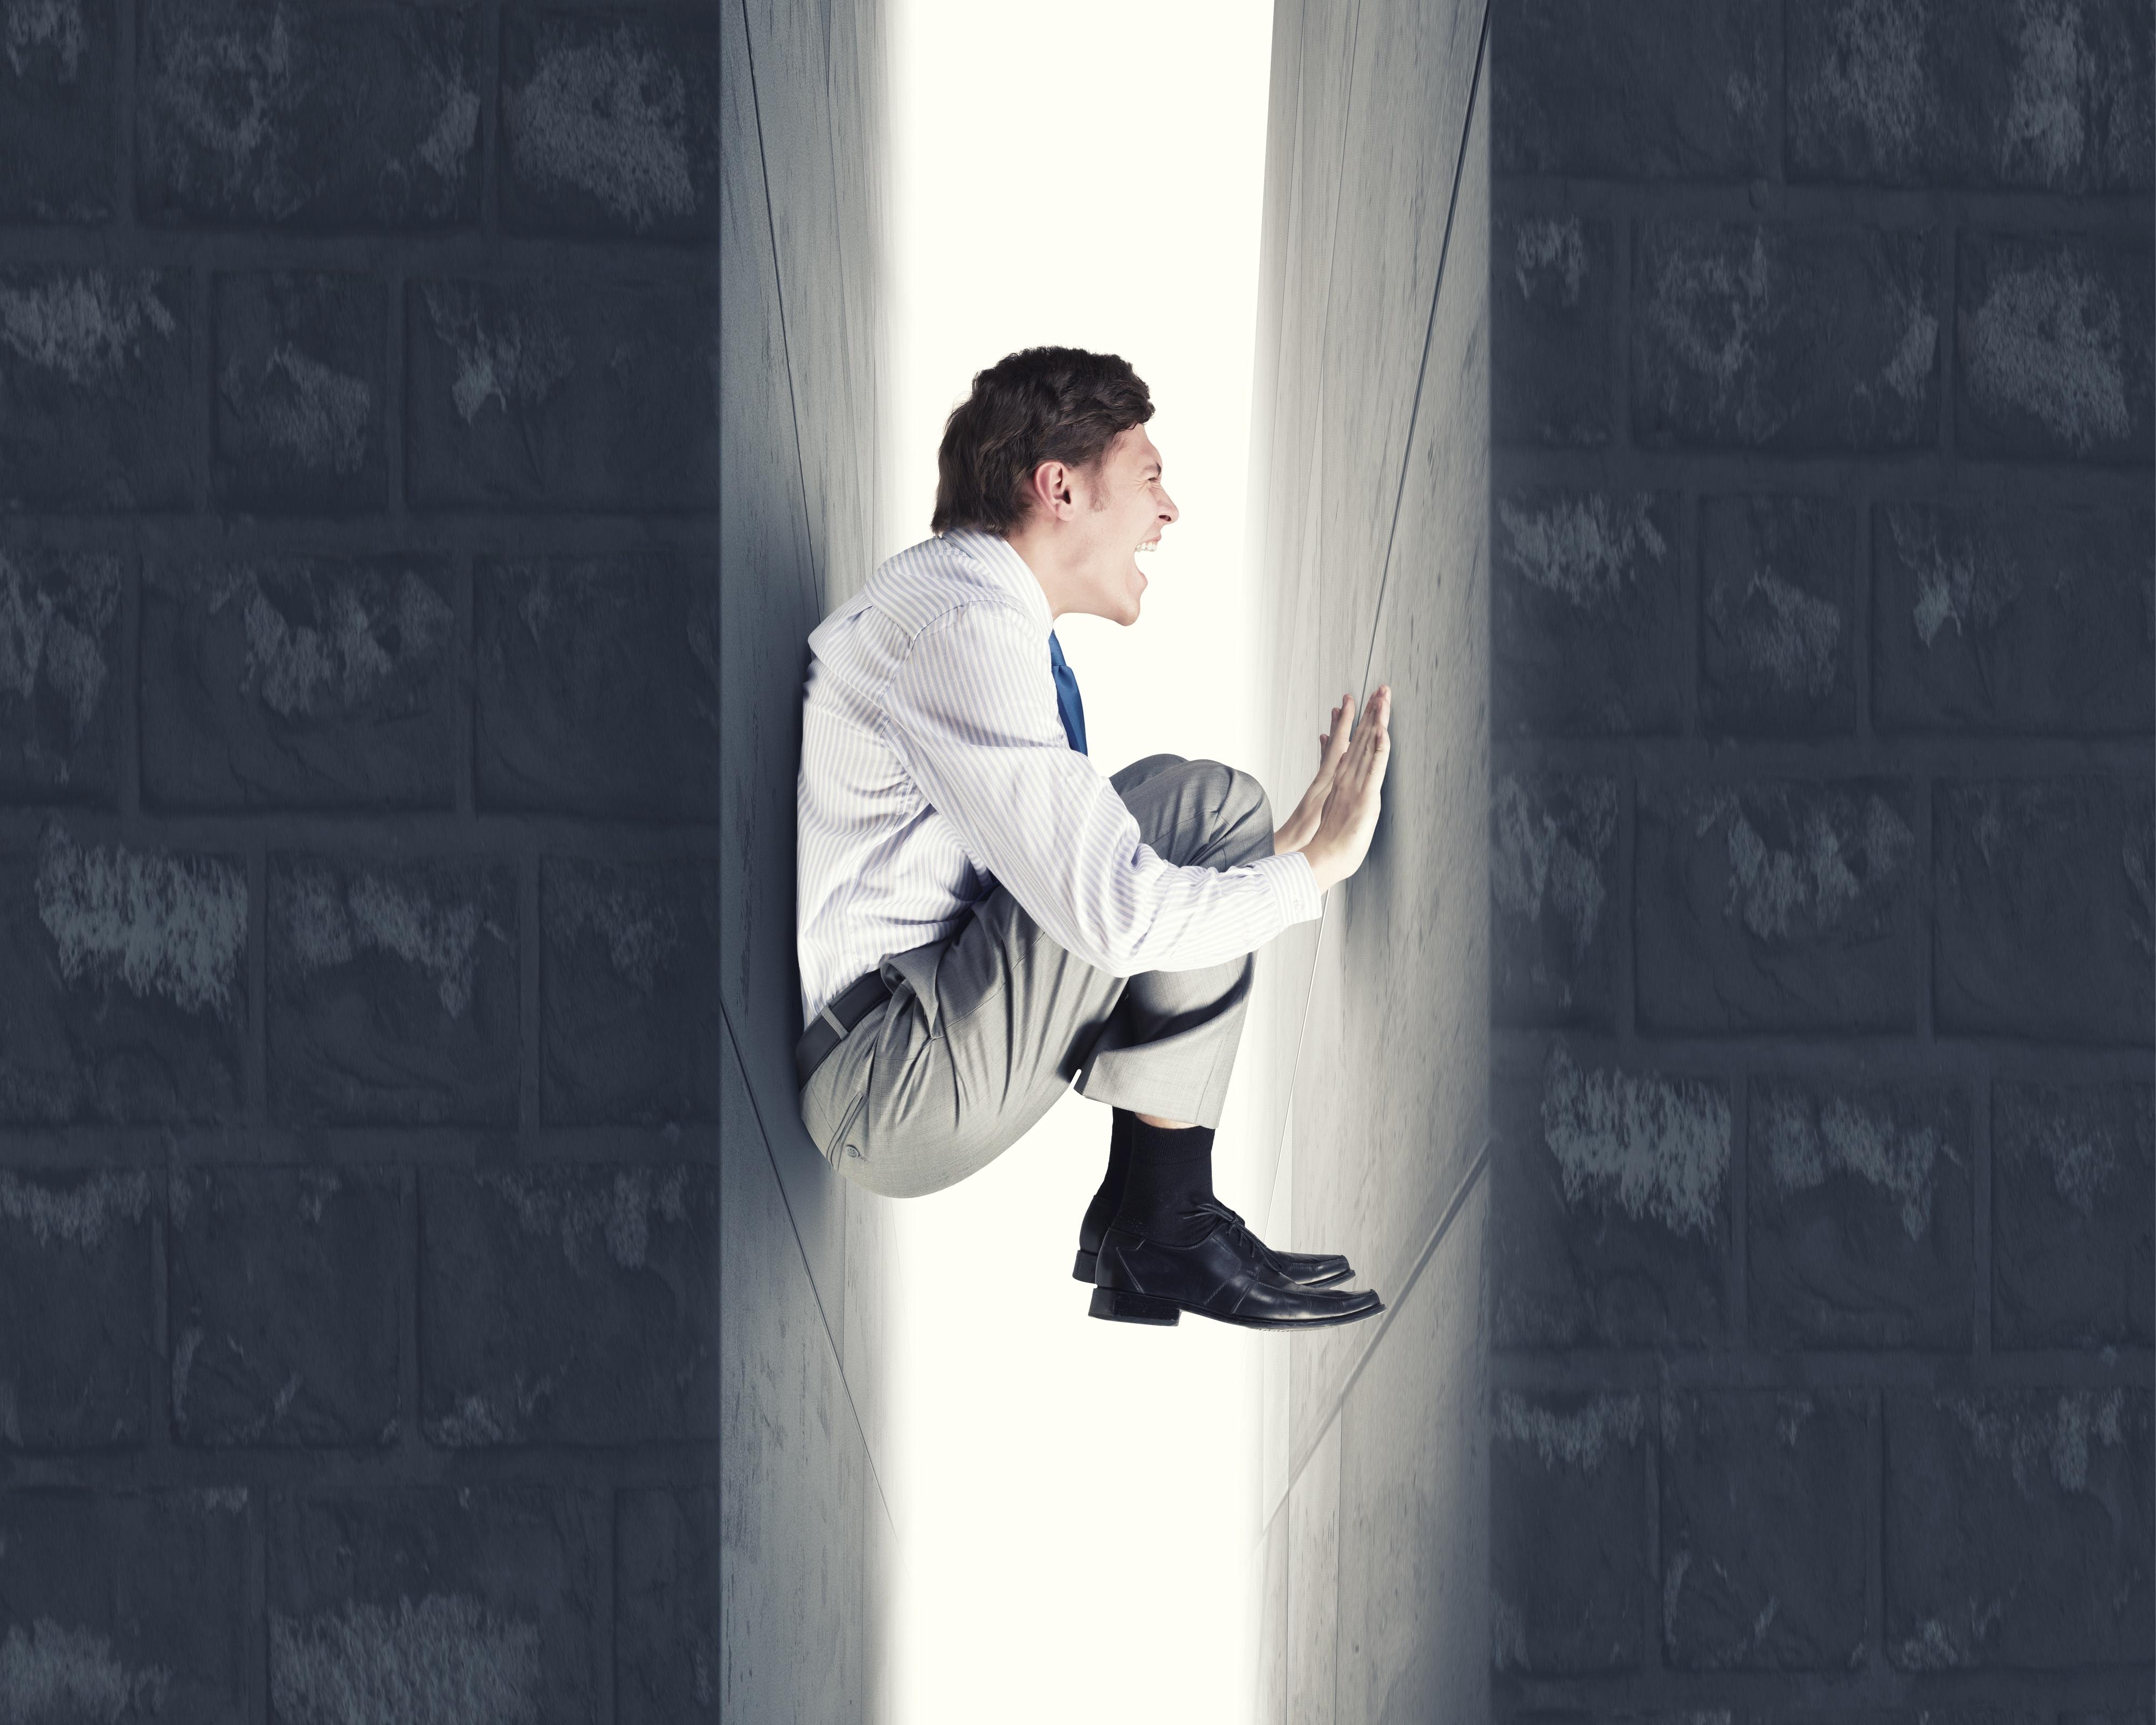 claustrophobia - most common phobias